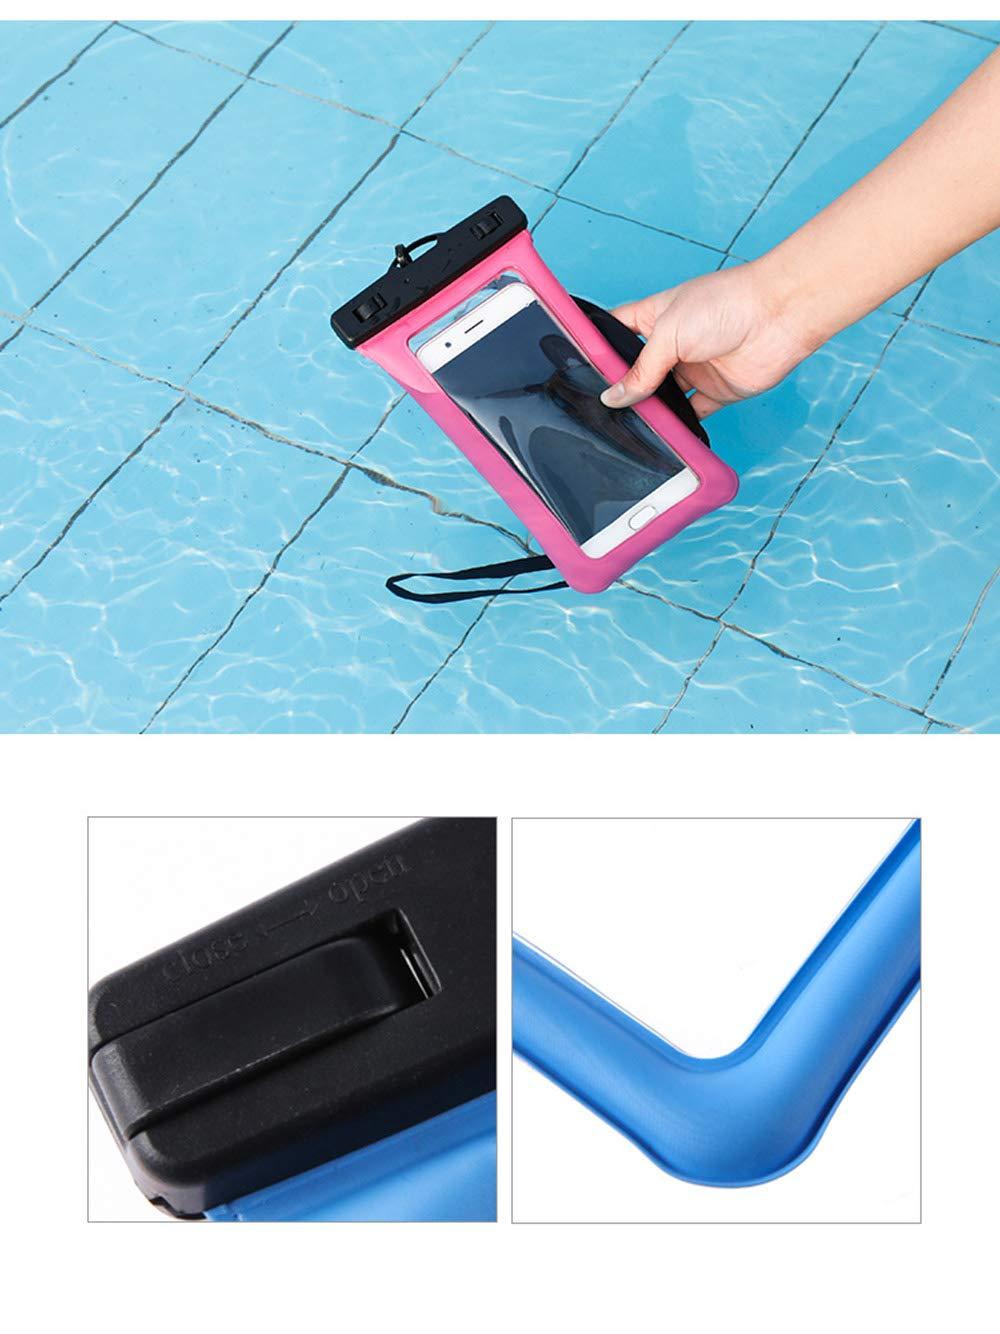 azul KAEHA fsd-0001-02-x Funda para tel/éfono m/óvil para rafting al aire libre